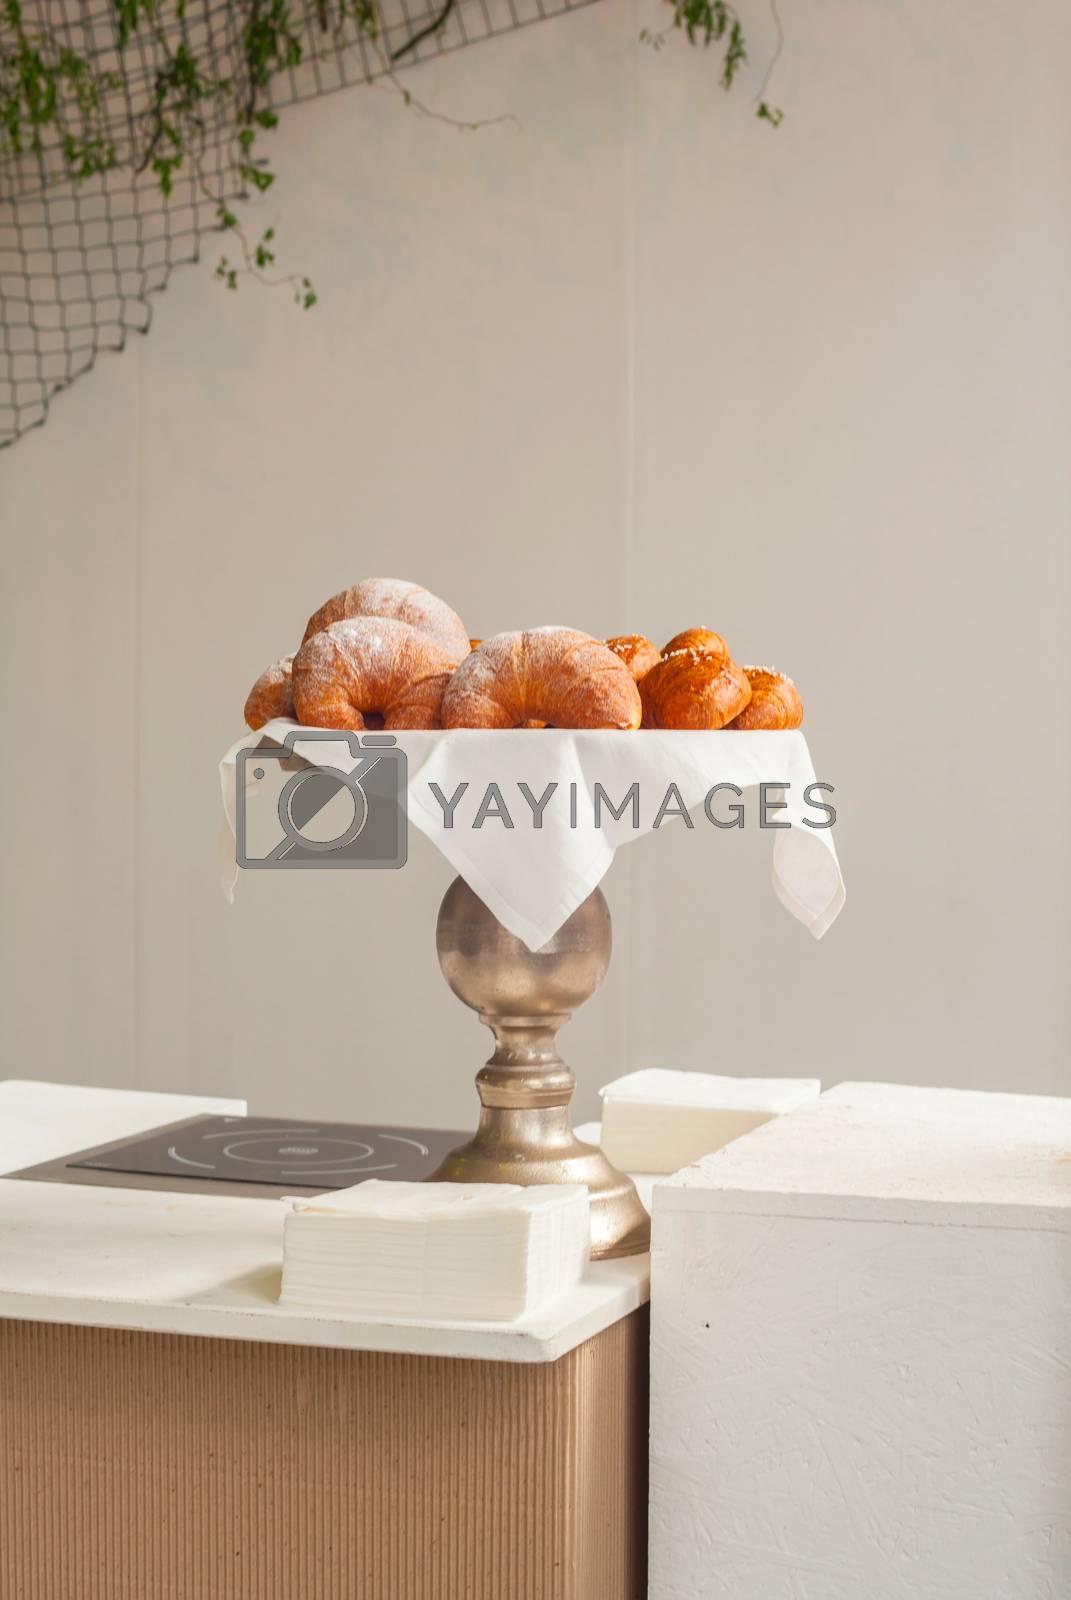 Italian croissants by bepsimage